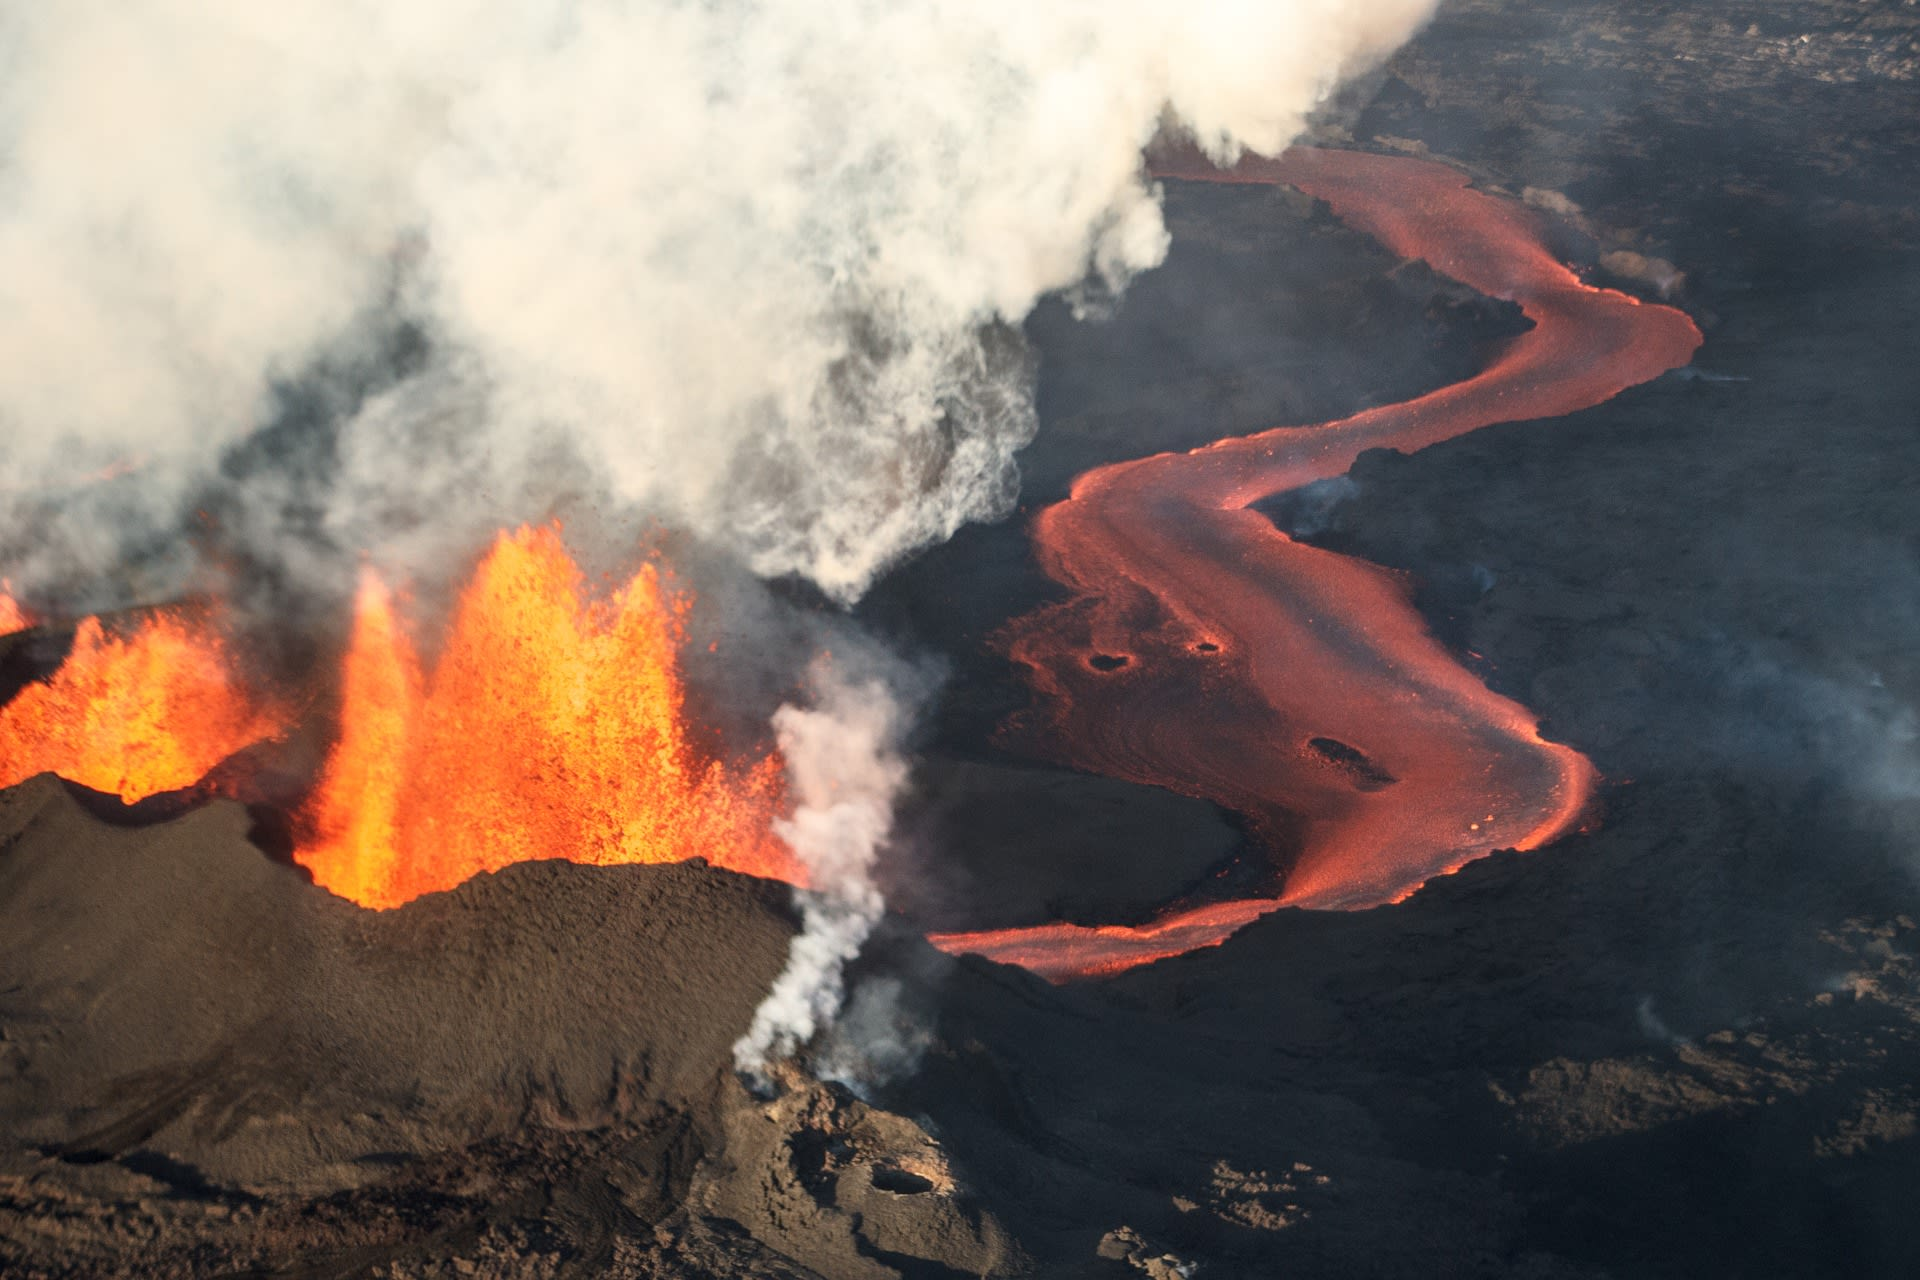 South Iceland - An Icelandic volcanic eruption - in progress!!